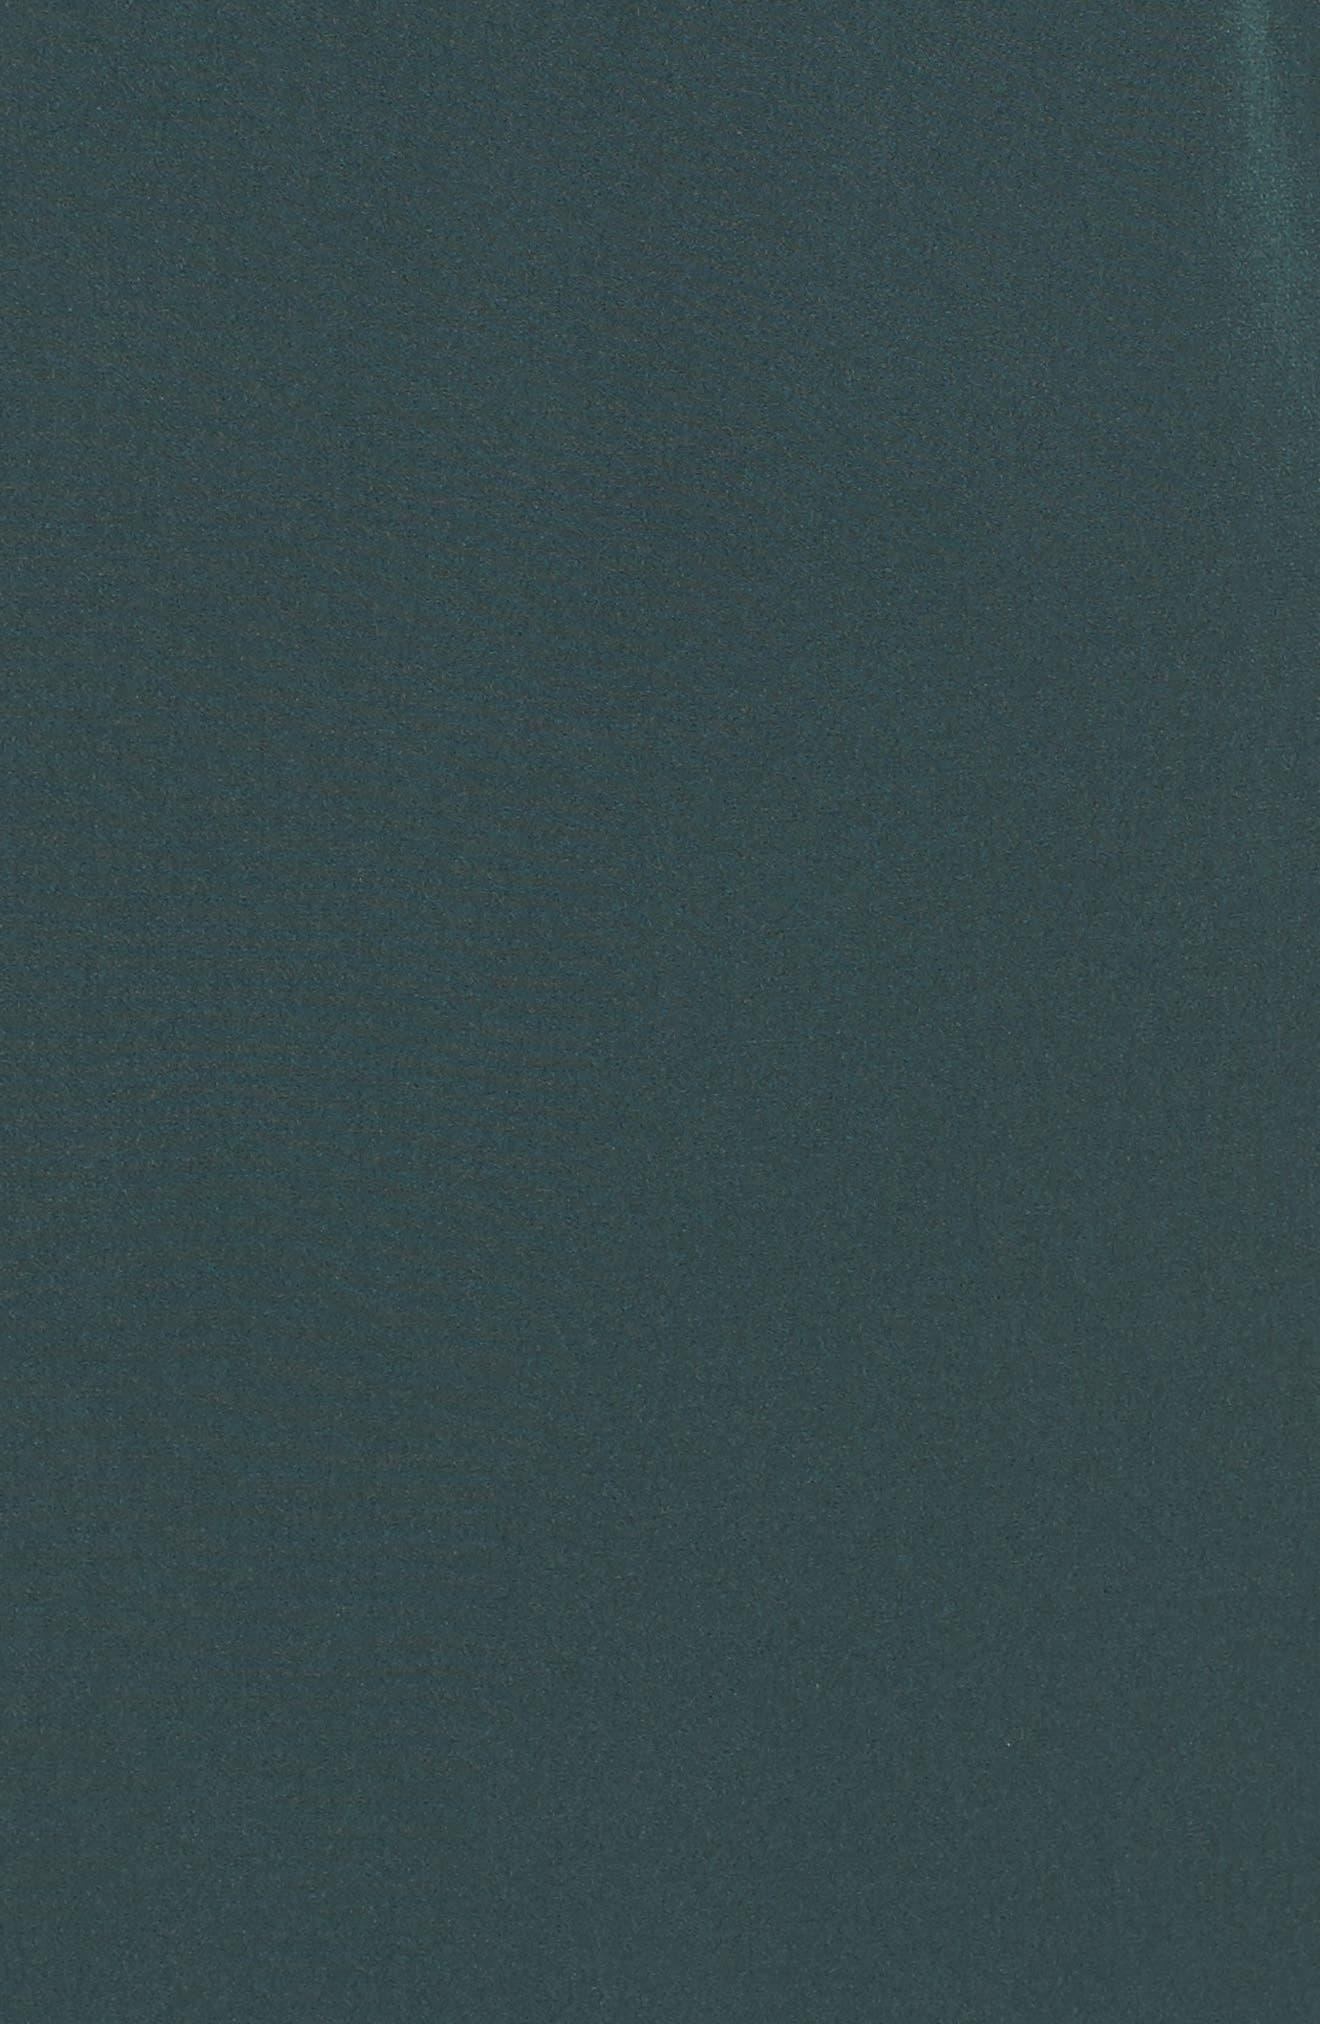 Ruffle Stretch Crepe Sheath Dress,                             Alternate thumbnail 26, color,